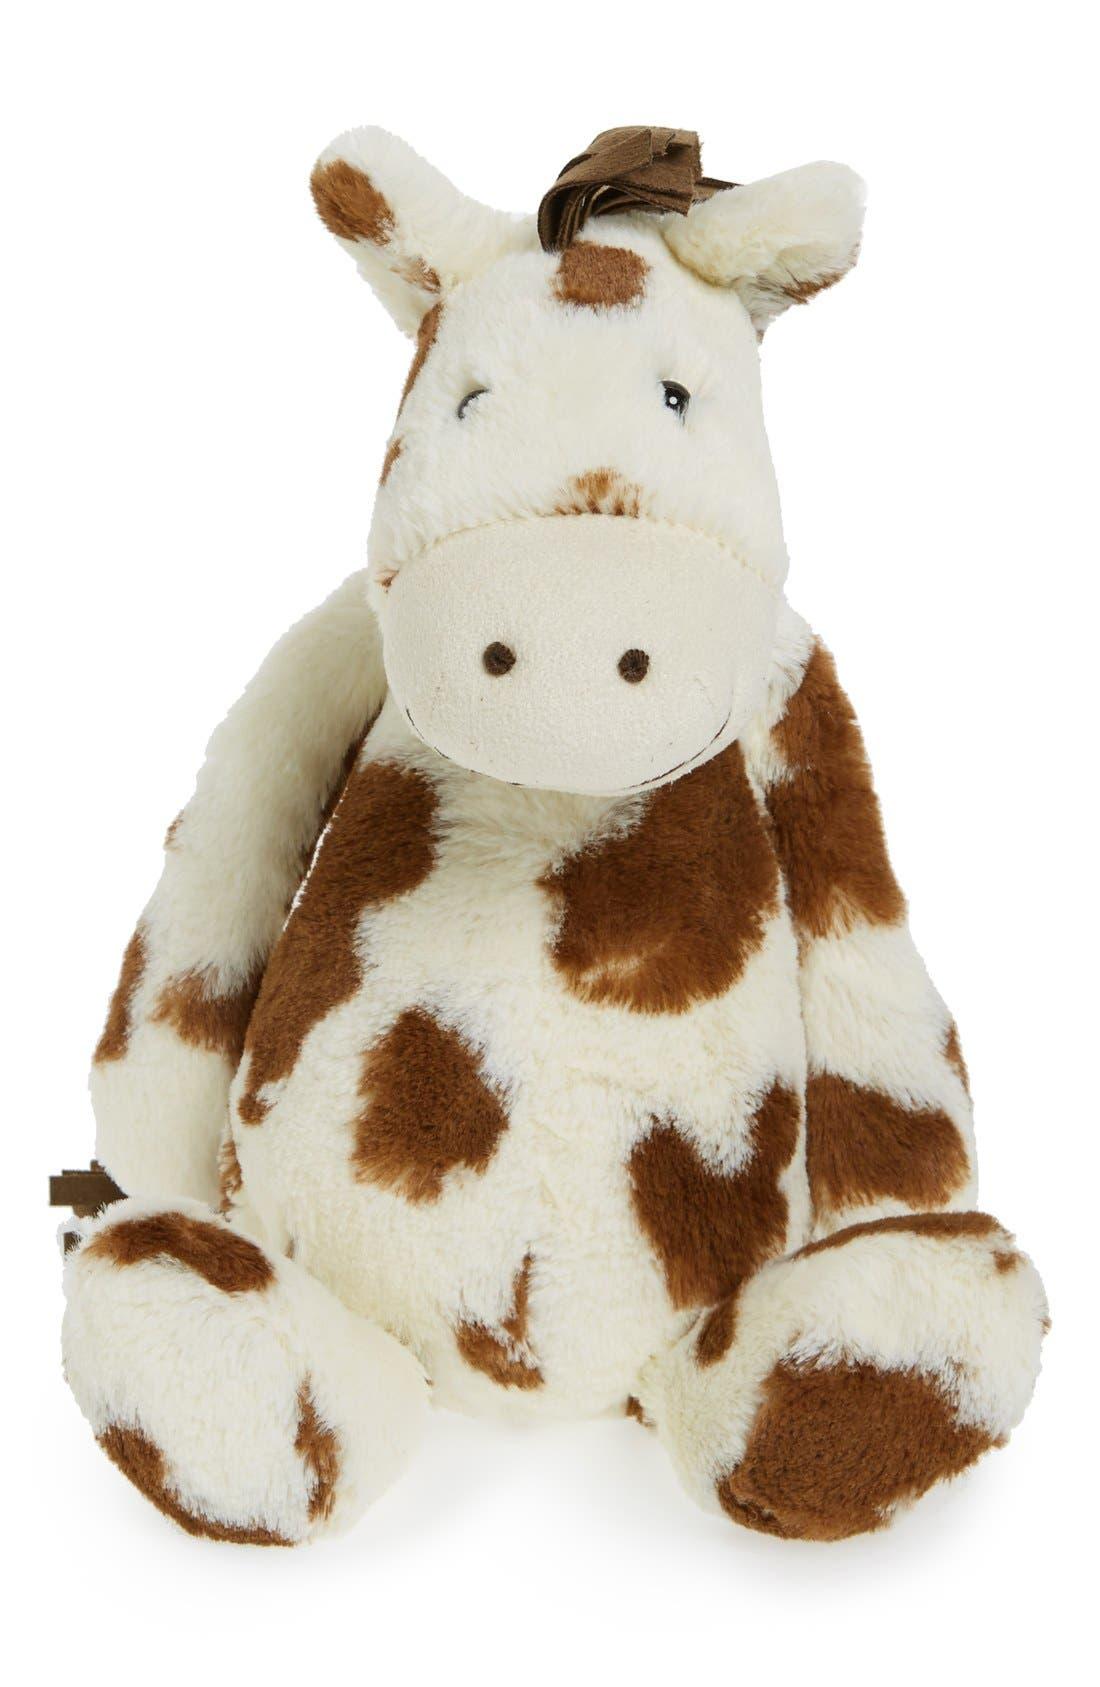 'Medium Bashful Pony' Stuffed Animal,                             Main thumbnail 1, color,                             230